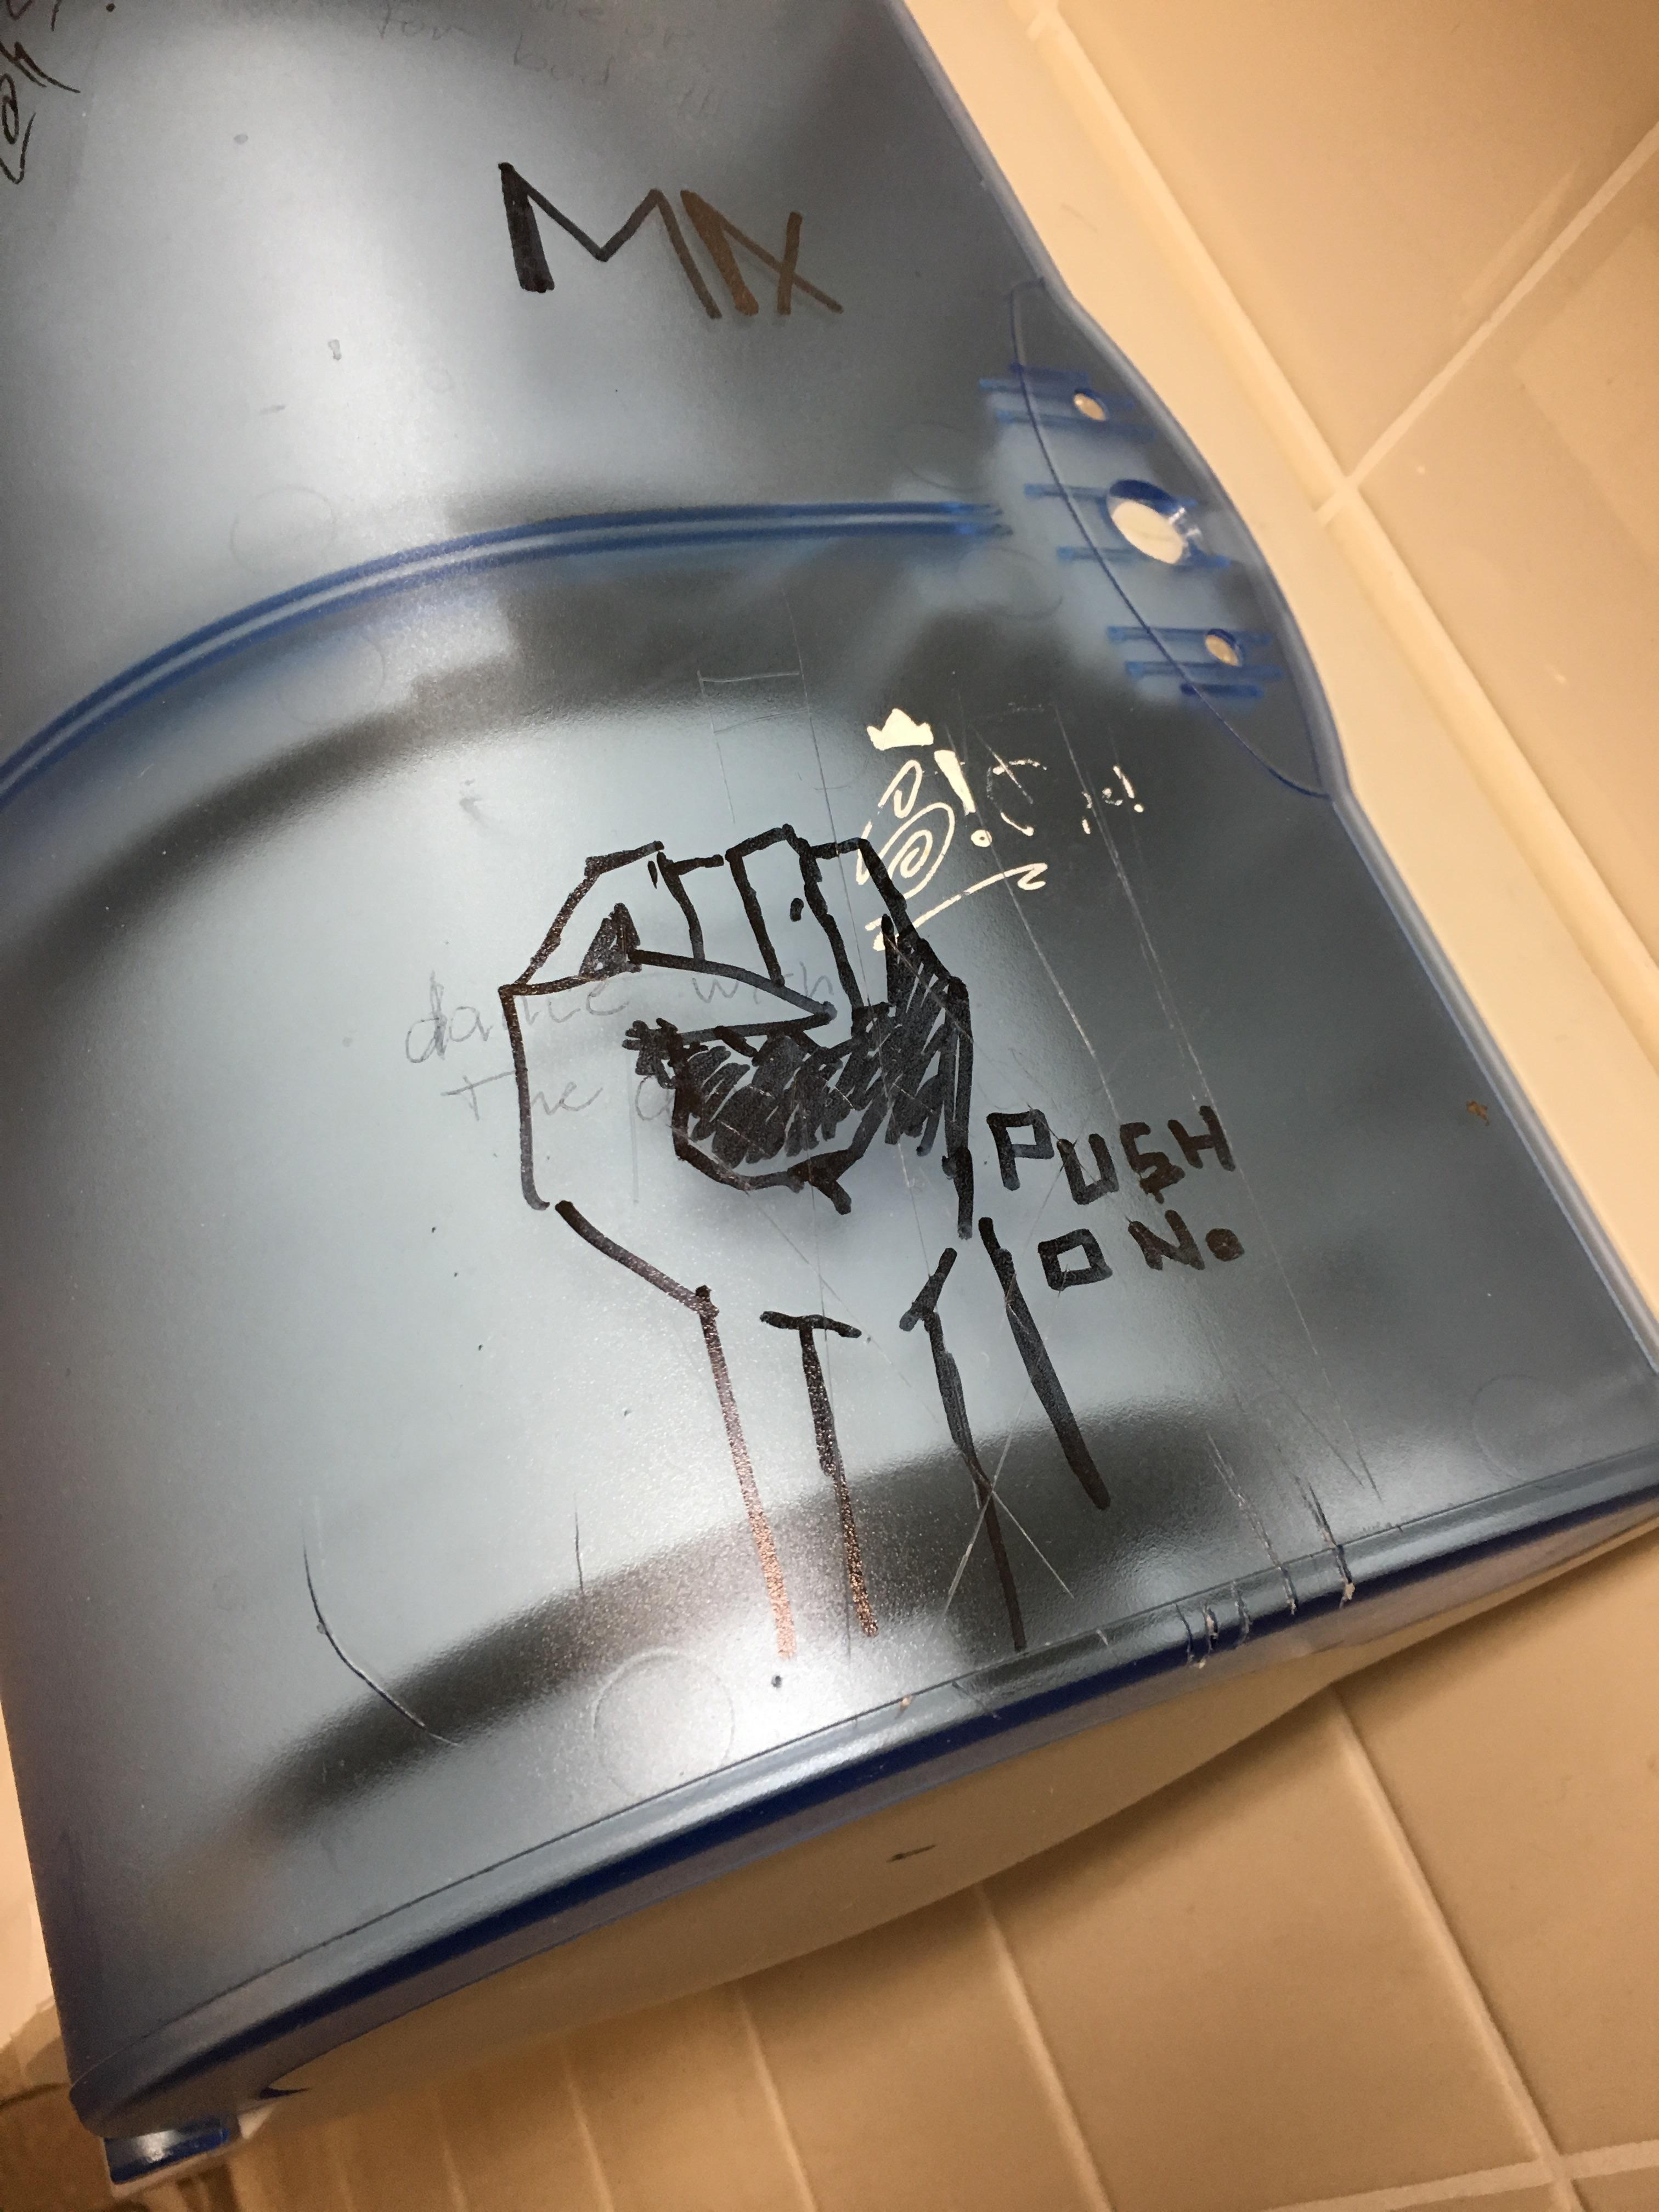 [Image] Found this bathroom graffiti to get me through Monday!